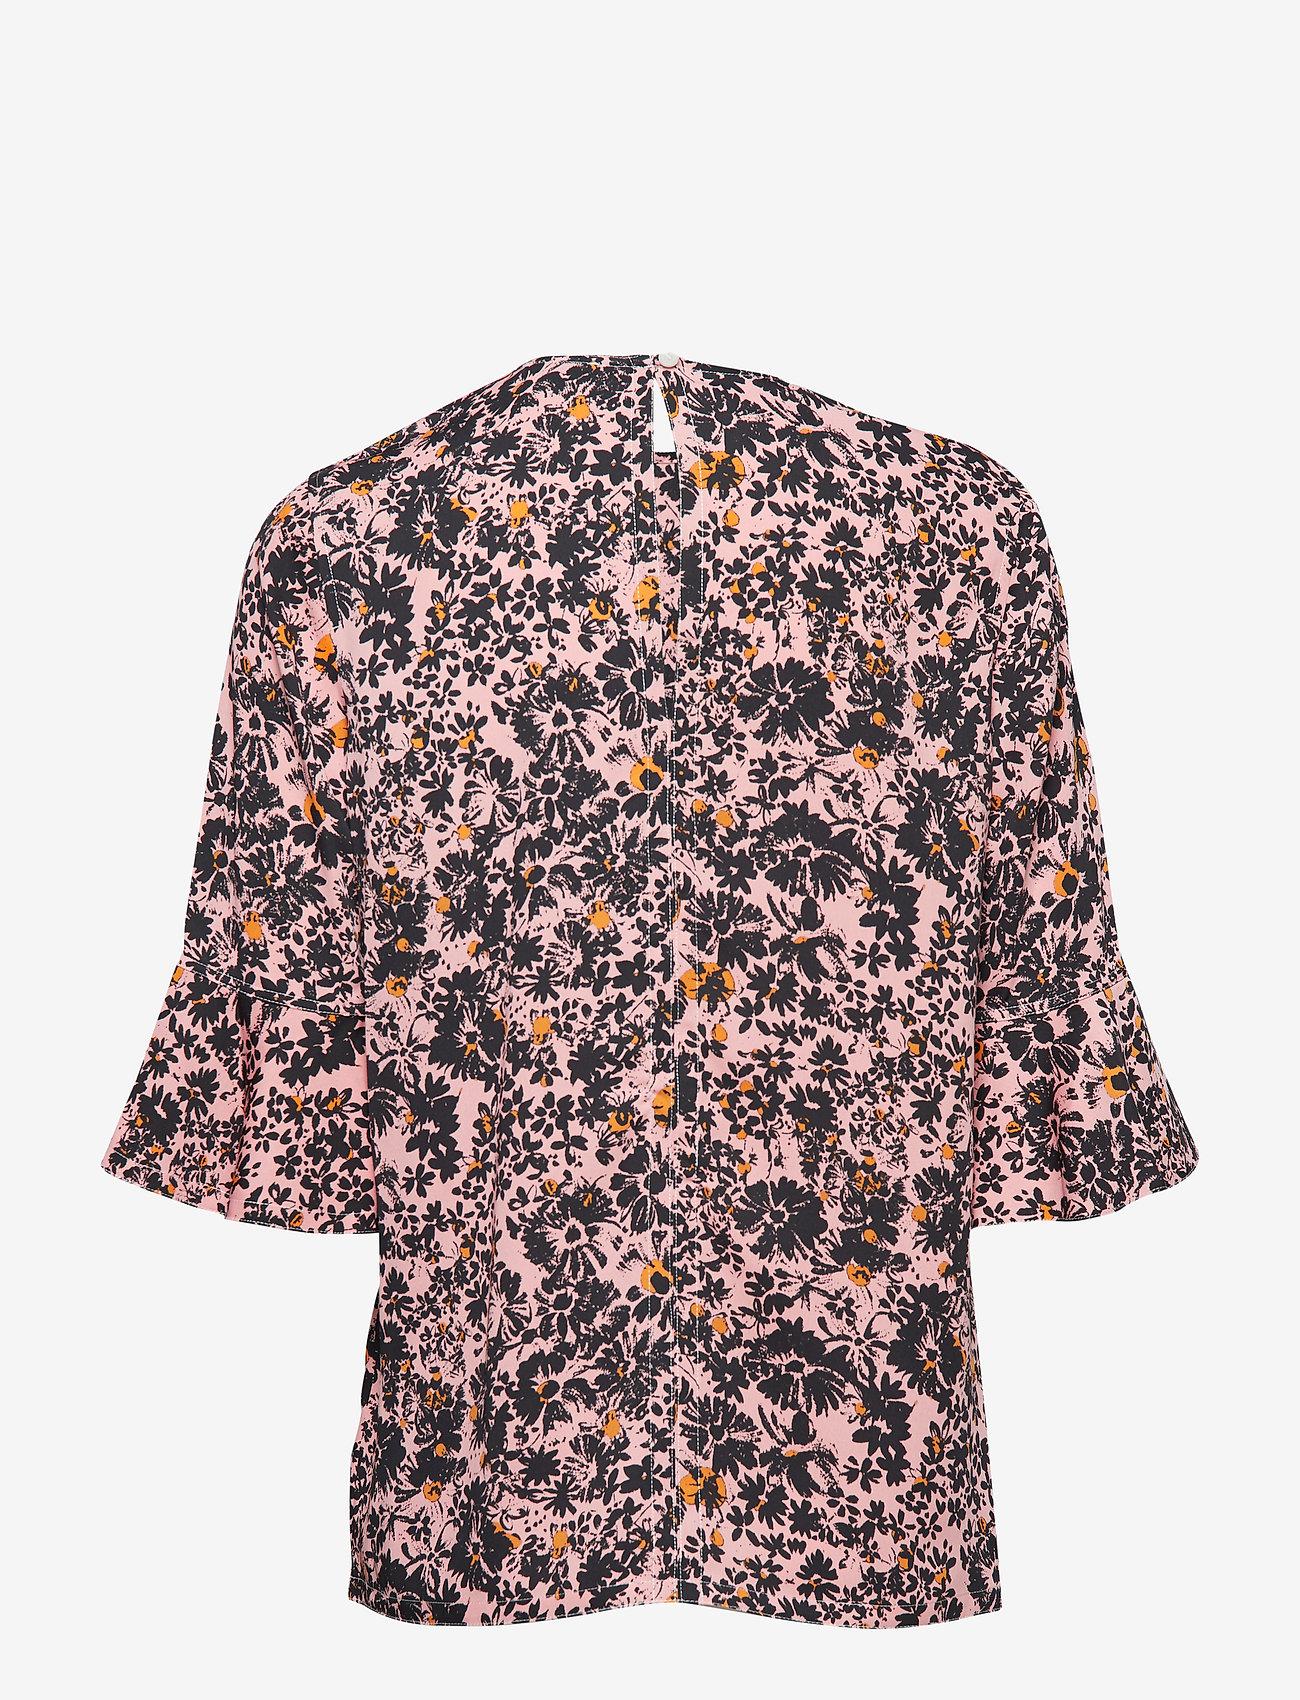 Prt Peplum Slv Blous (Blush Floral Large) (550 kr) - Calvin Klein